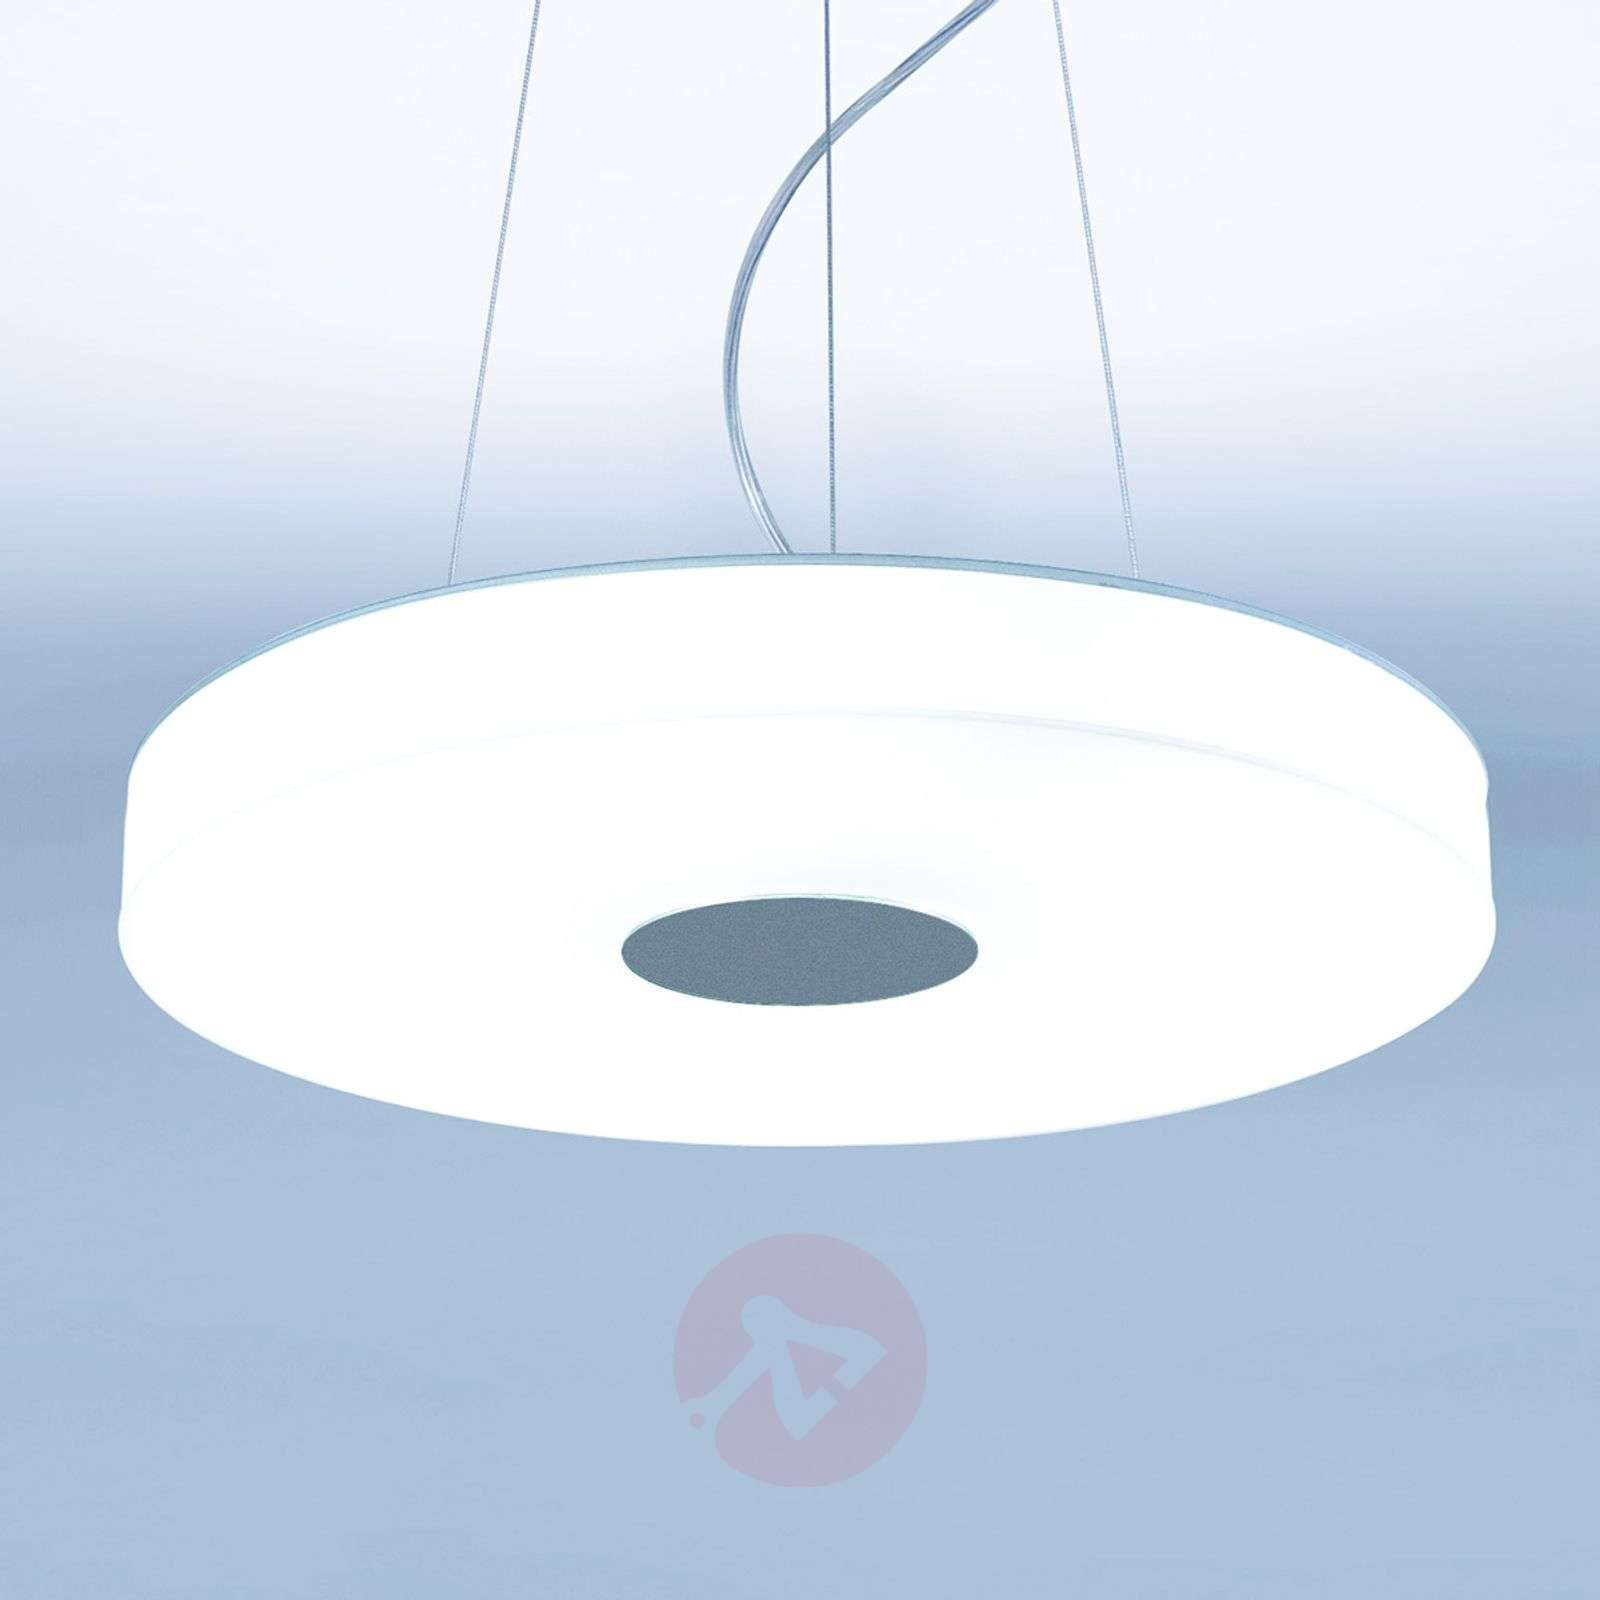 Sierstrip Chroom Badkamer : Wax p1 extensively shining led hanging light 40 cm lights.ie